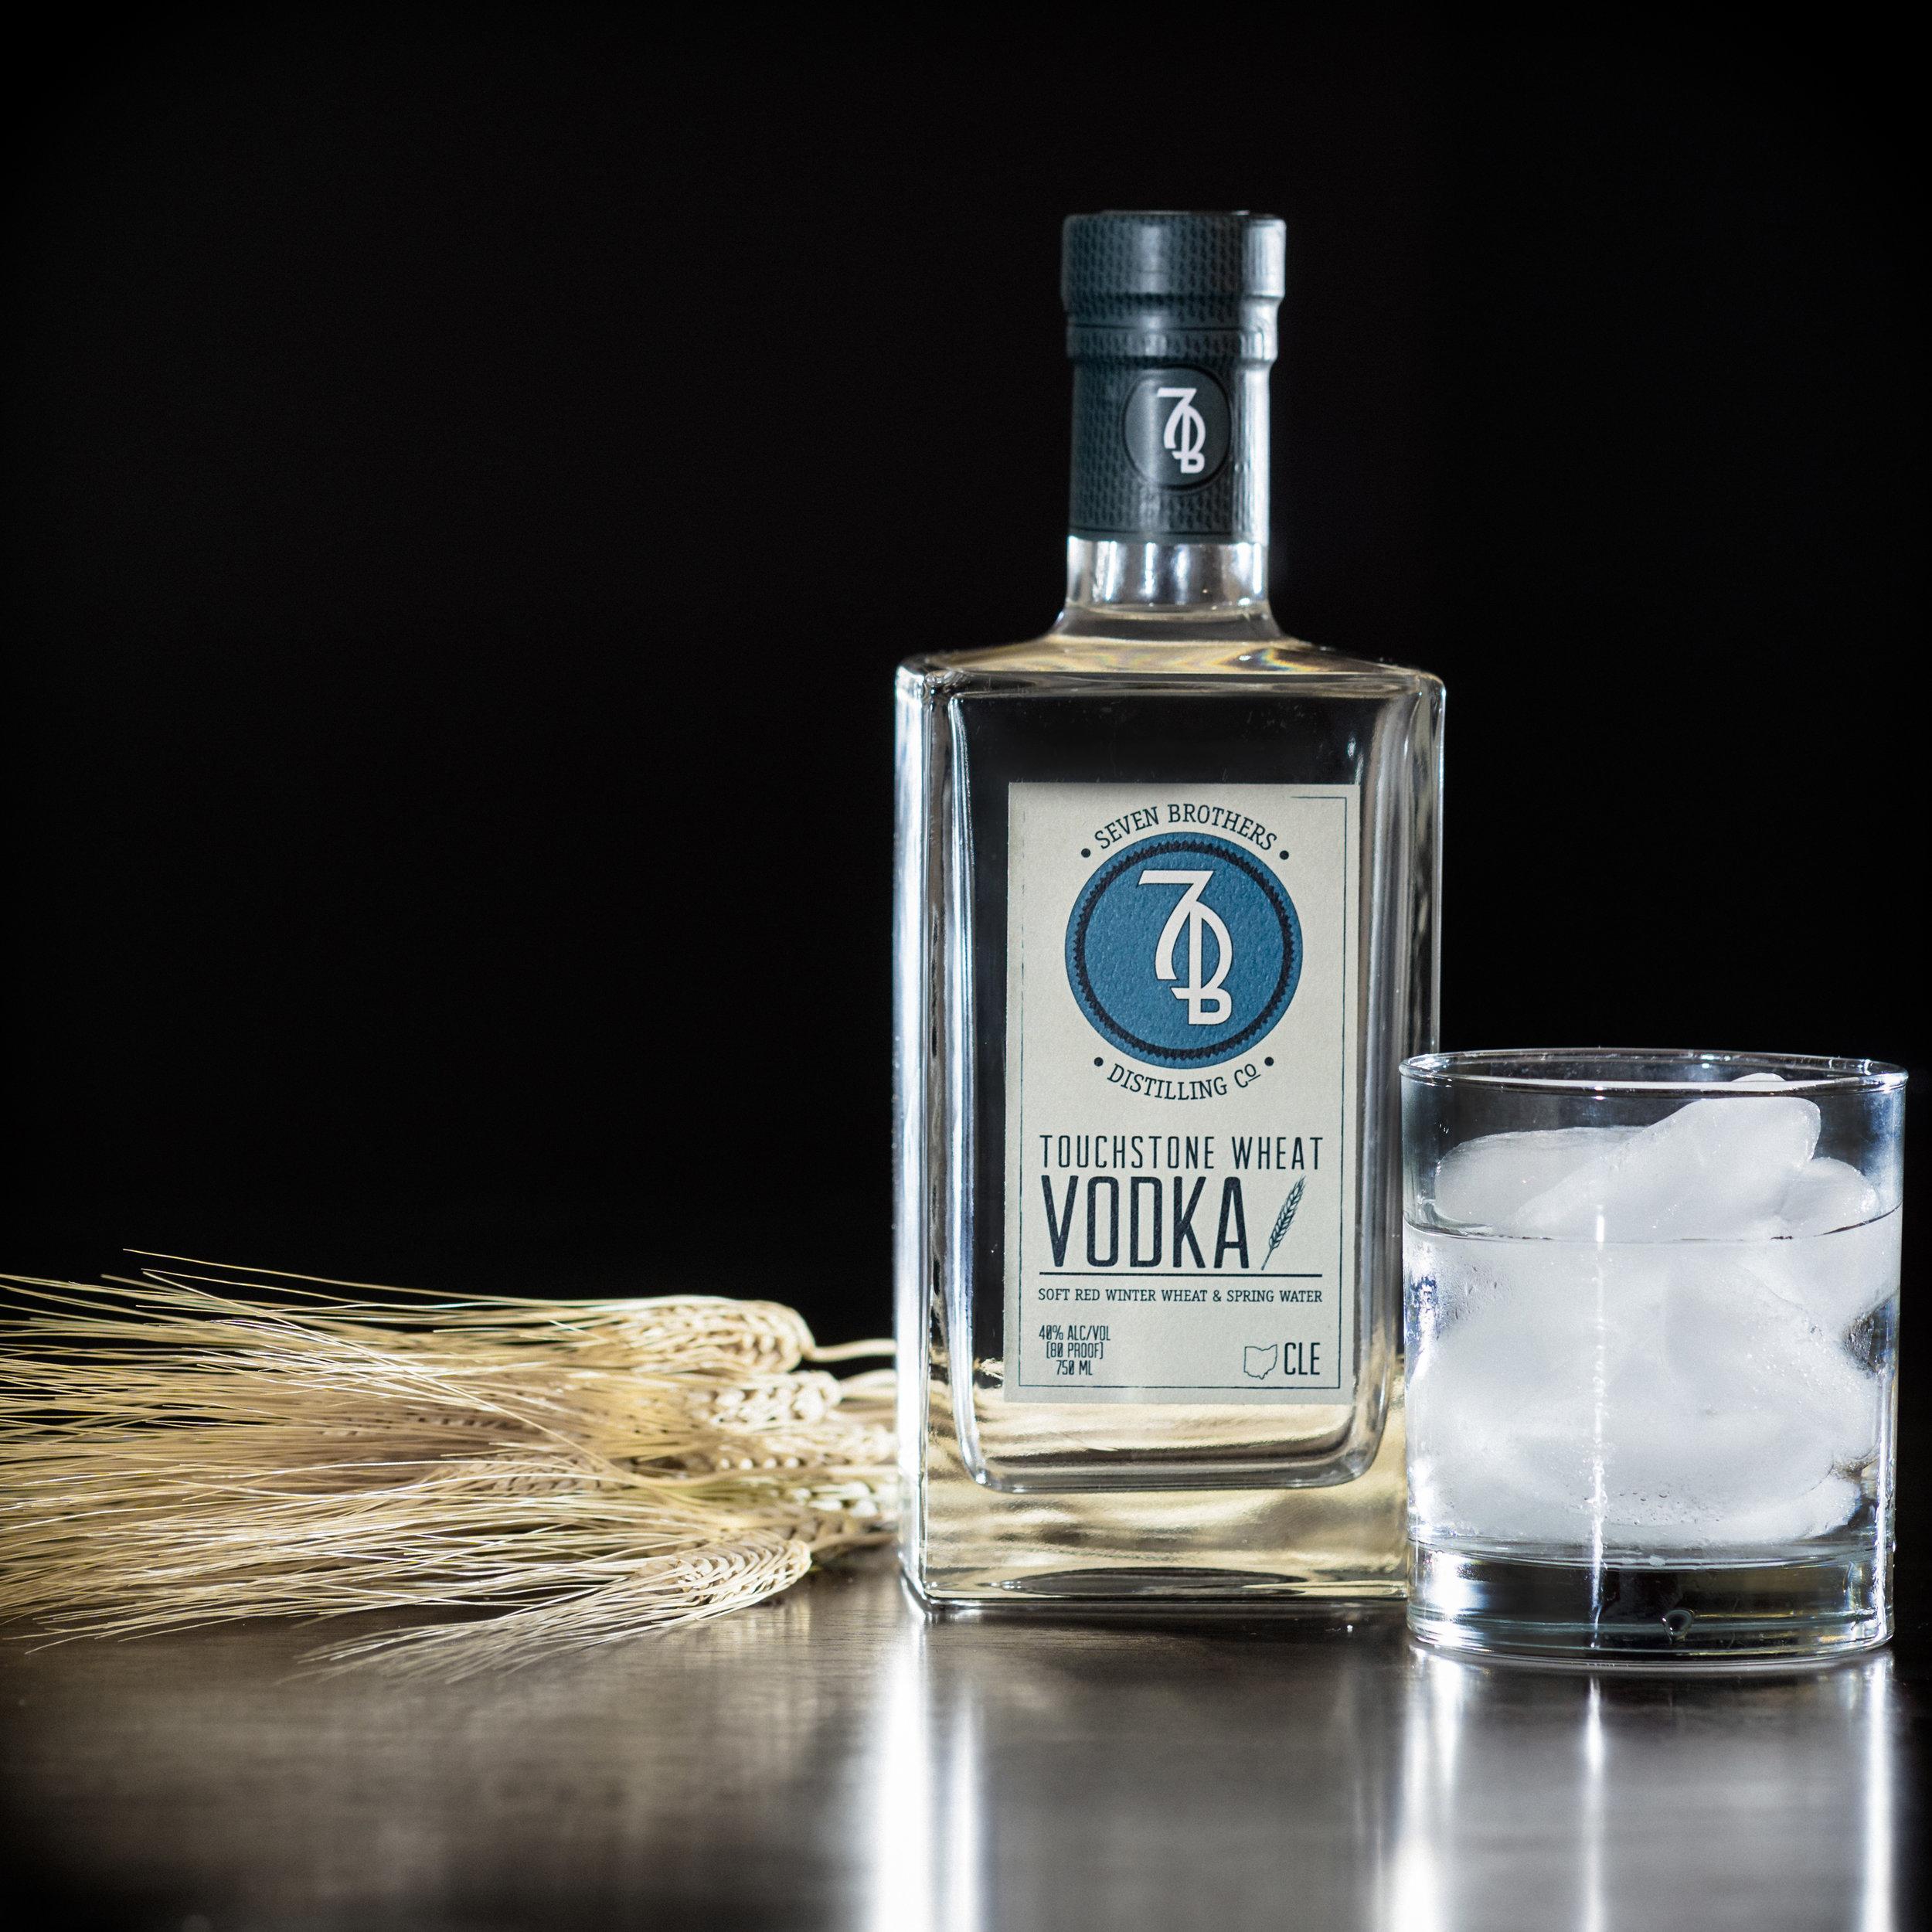 Touchstone Wheat Vodka